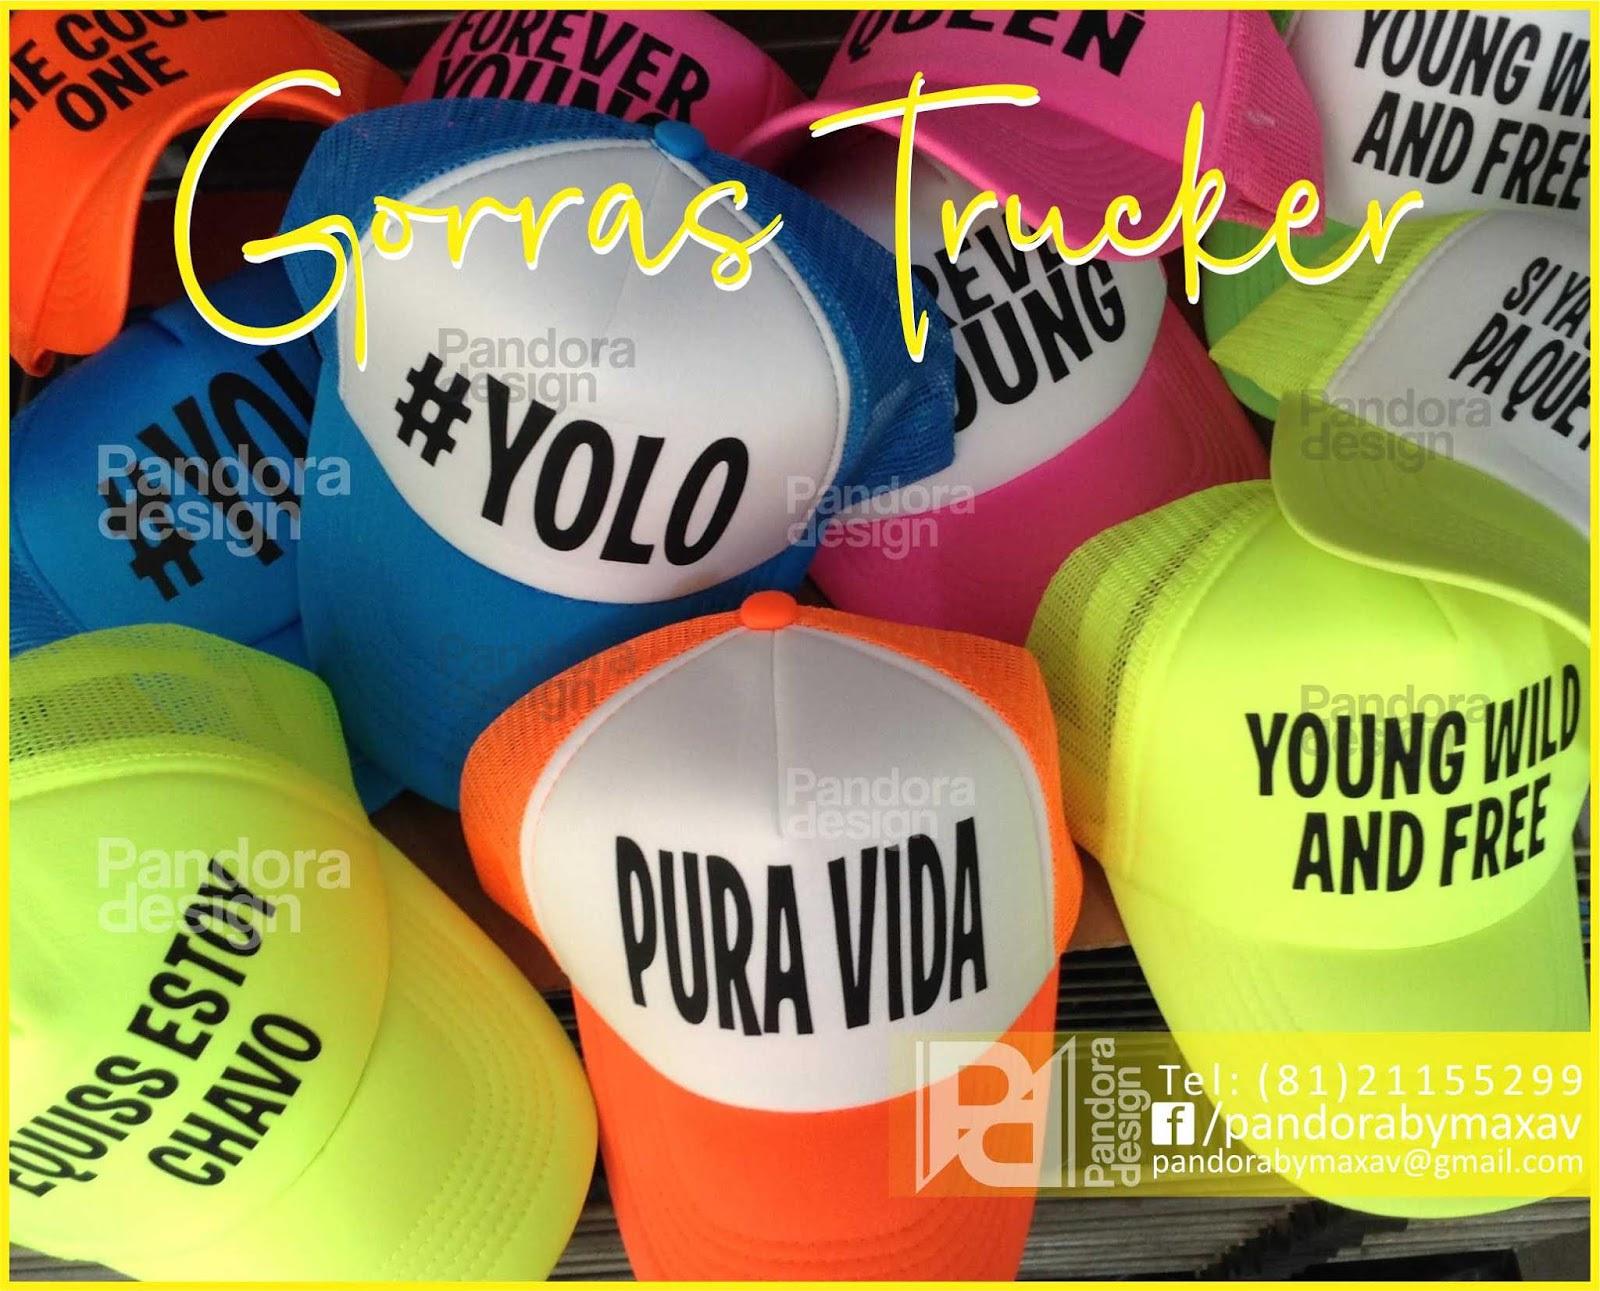 Gorras Personalziadas Con Frases Para Eventos Pandora